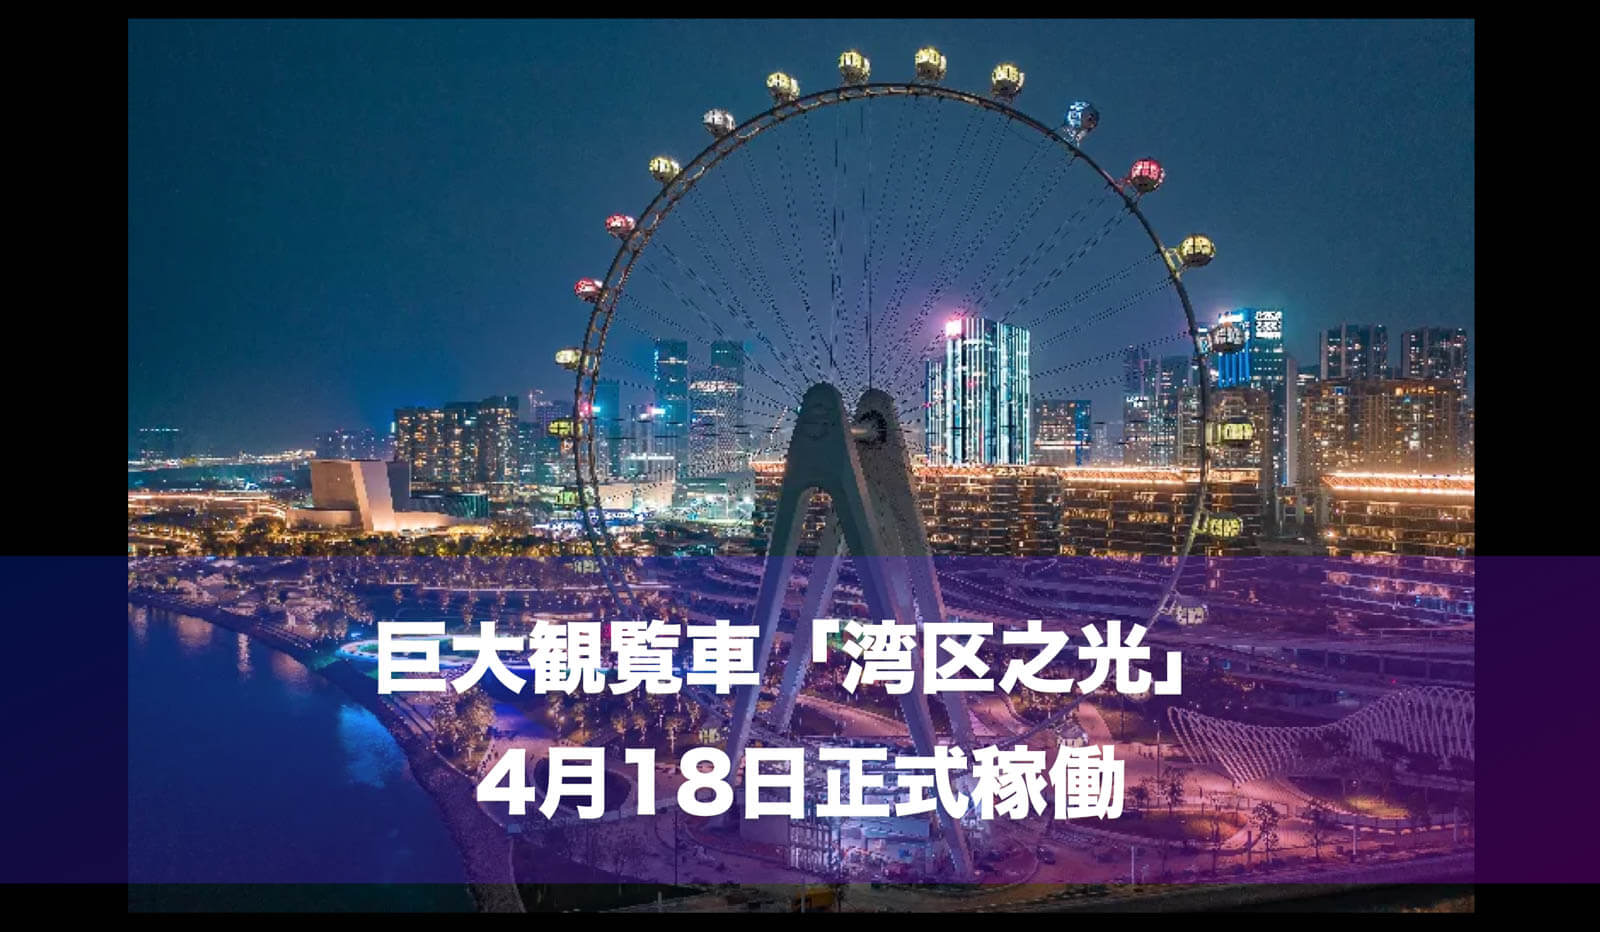 中国第二位の巨大観覧車「湾区之光」4月18日に正式稼働!